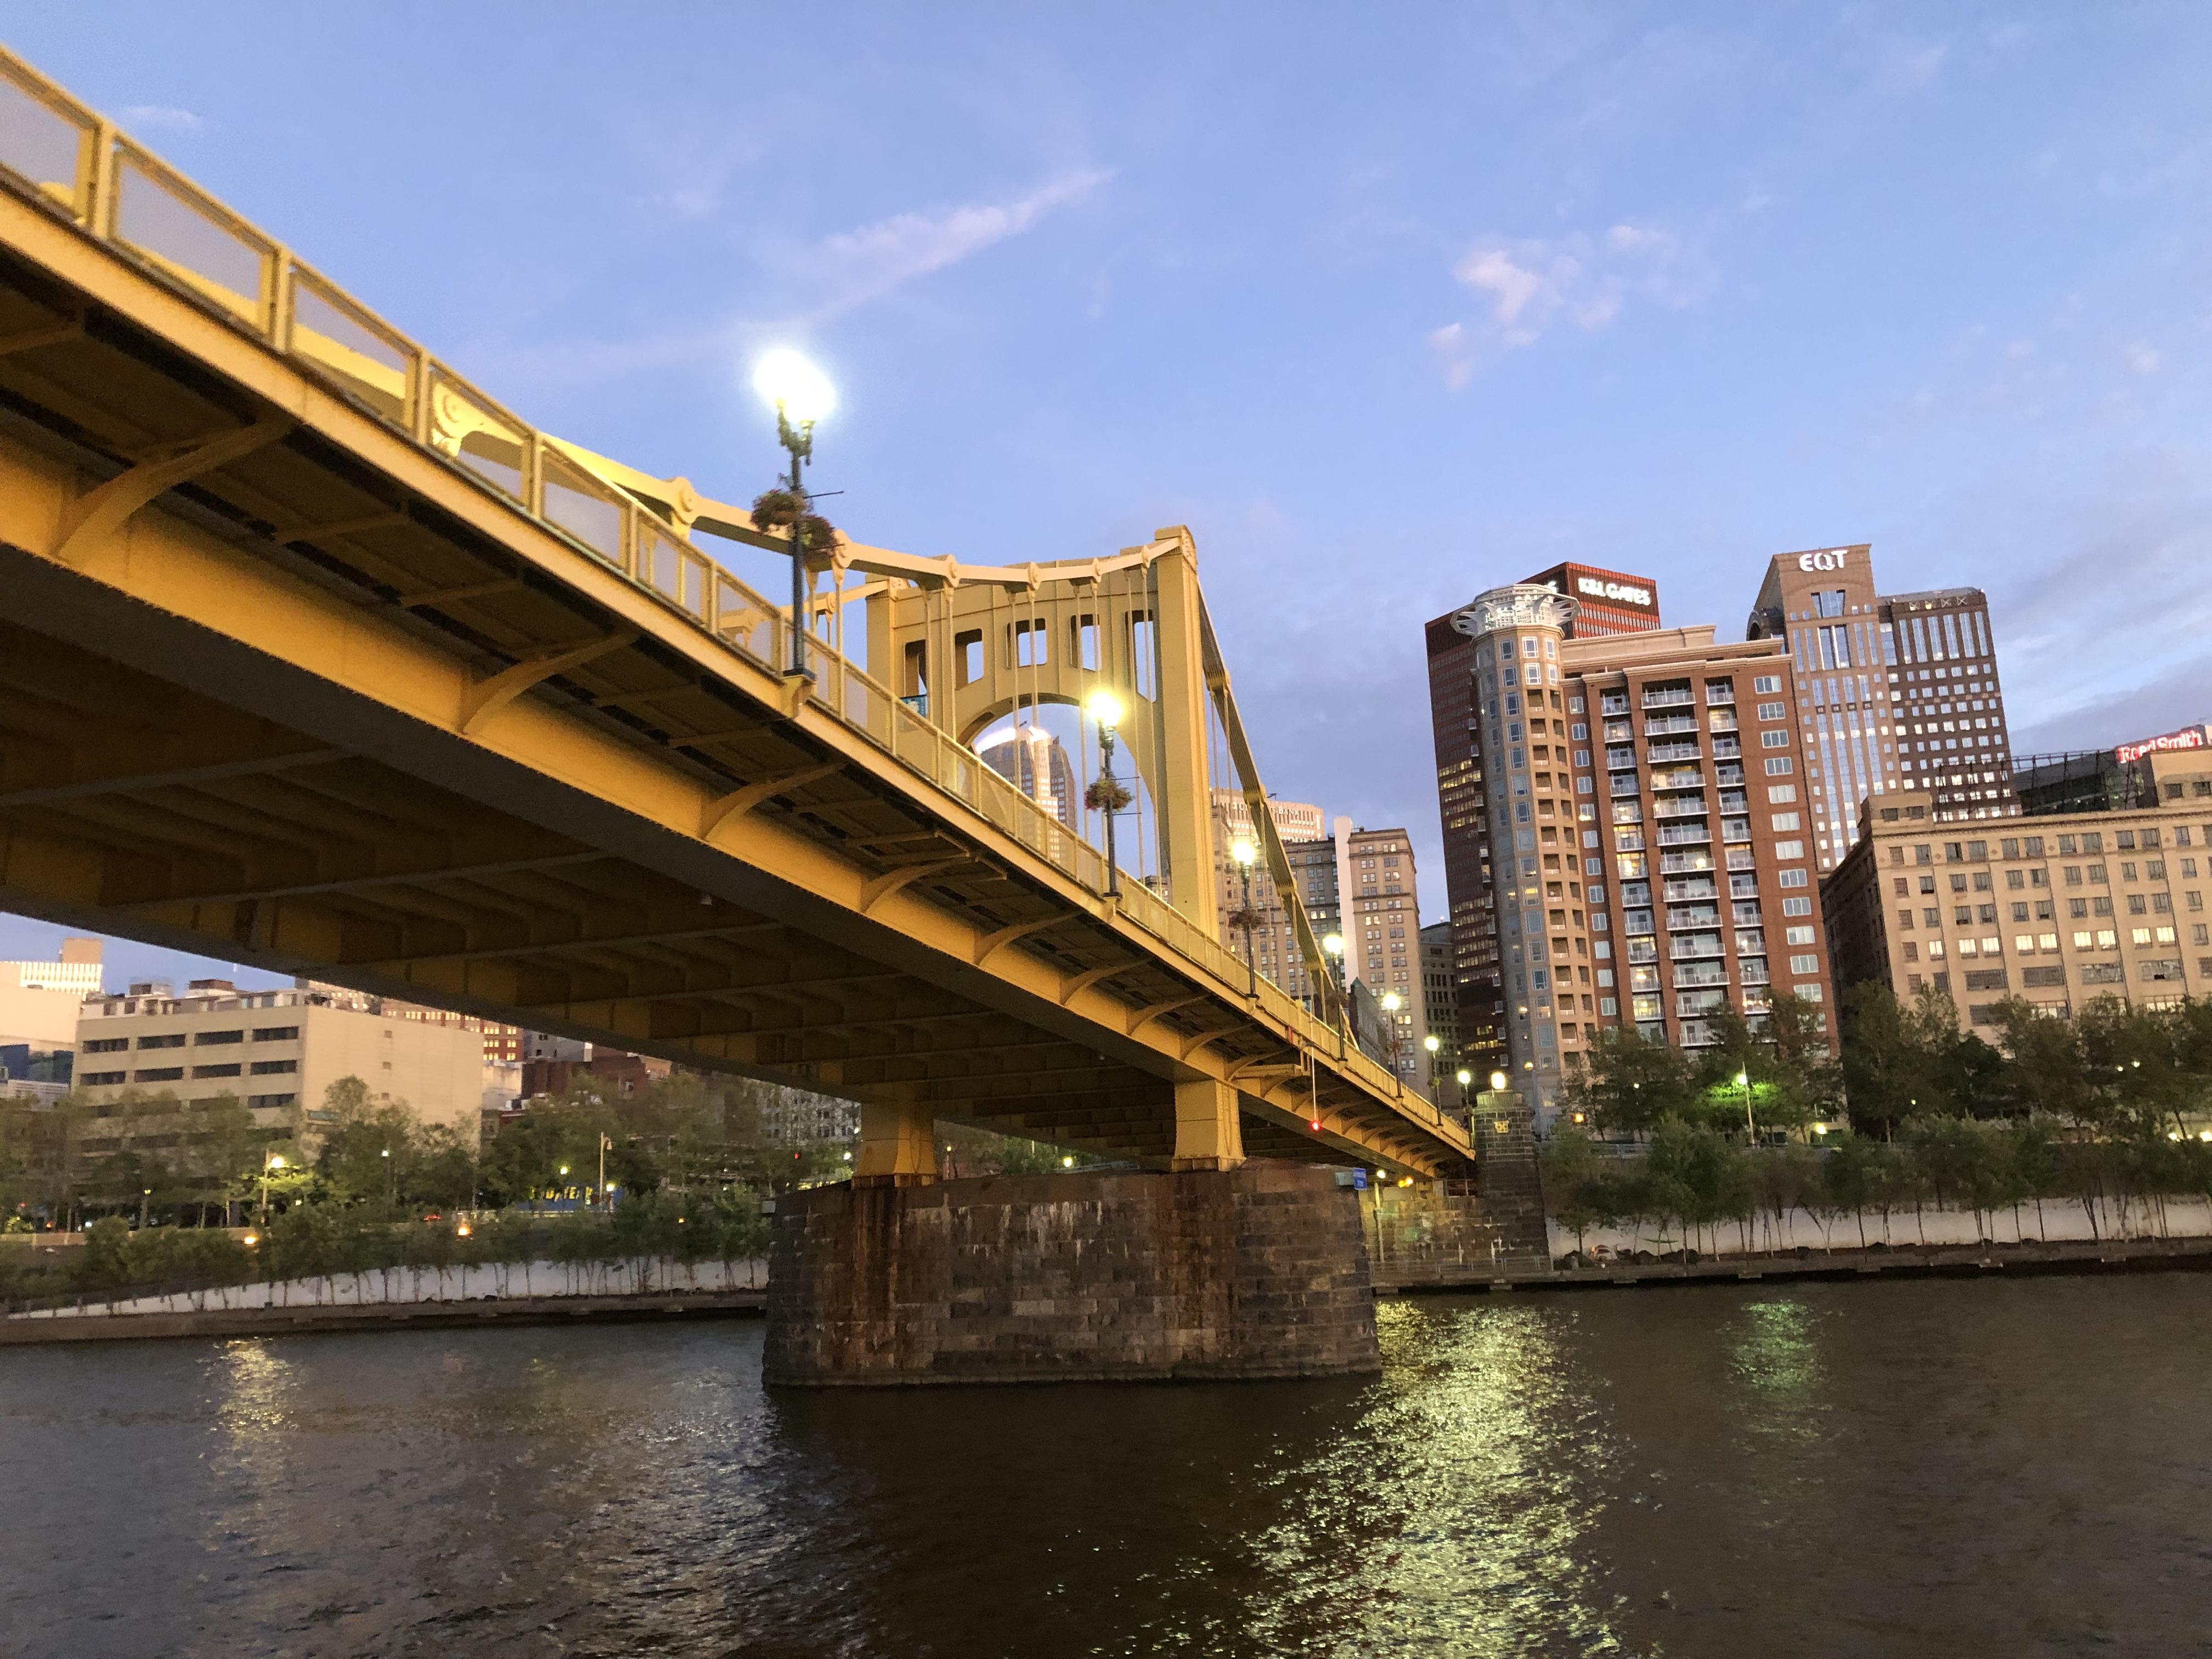 pgh_alleghenyriver_citybridge